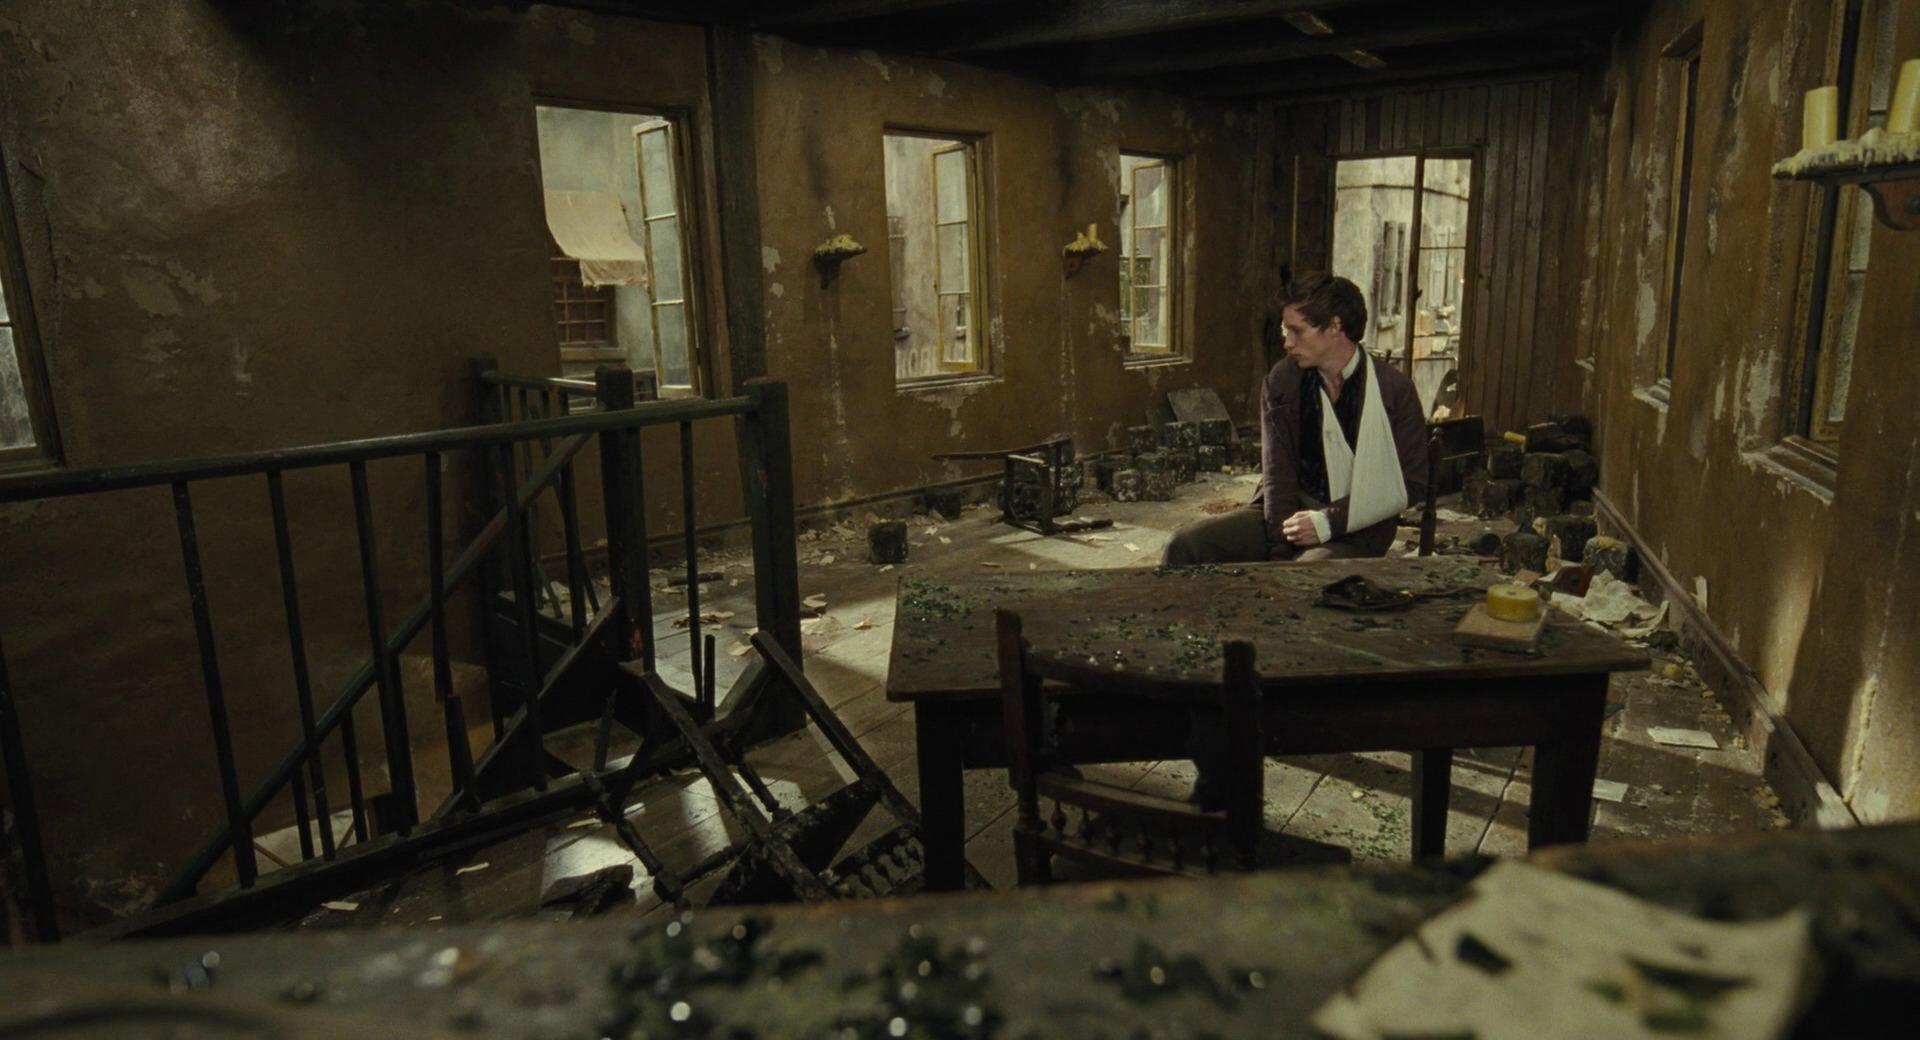 Period Drama Amp C Les Miserables 2012 Movie Review Part 3